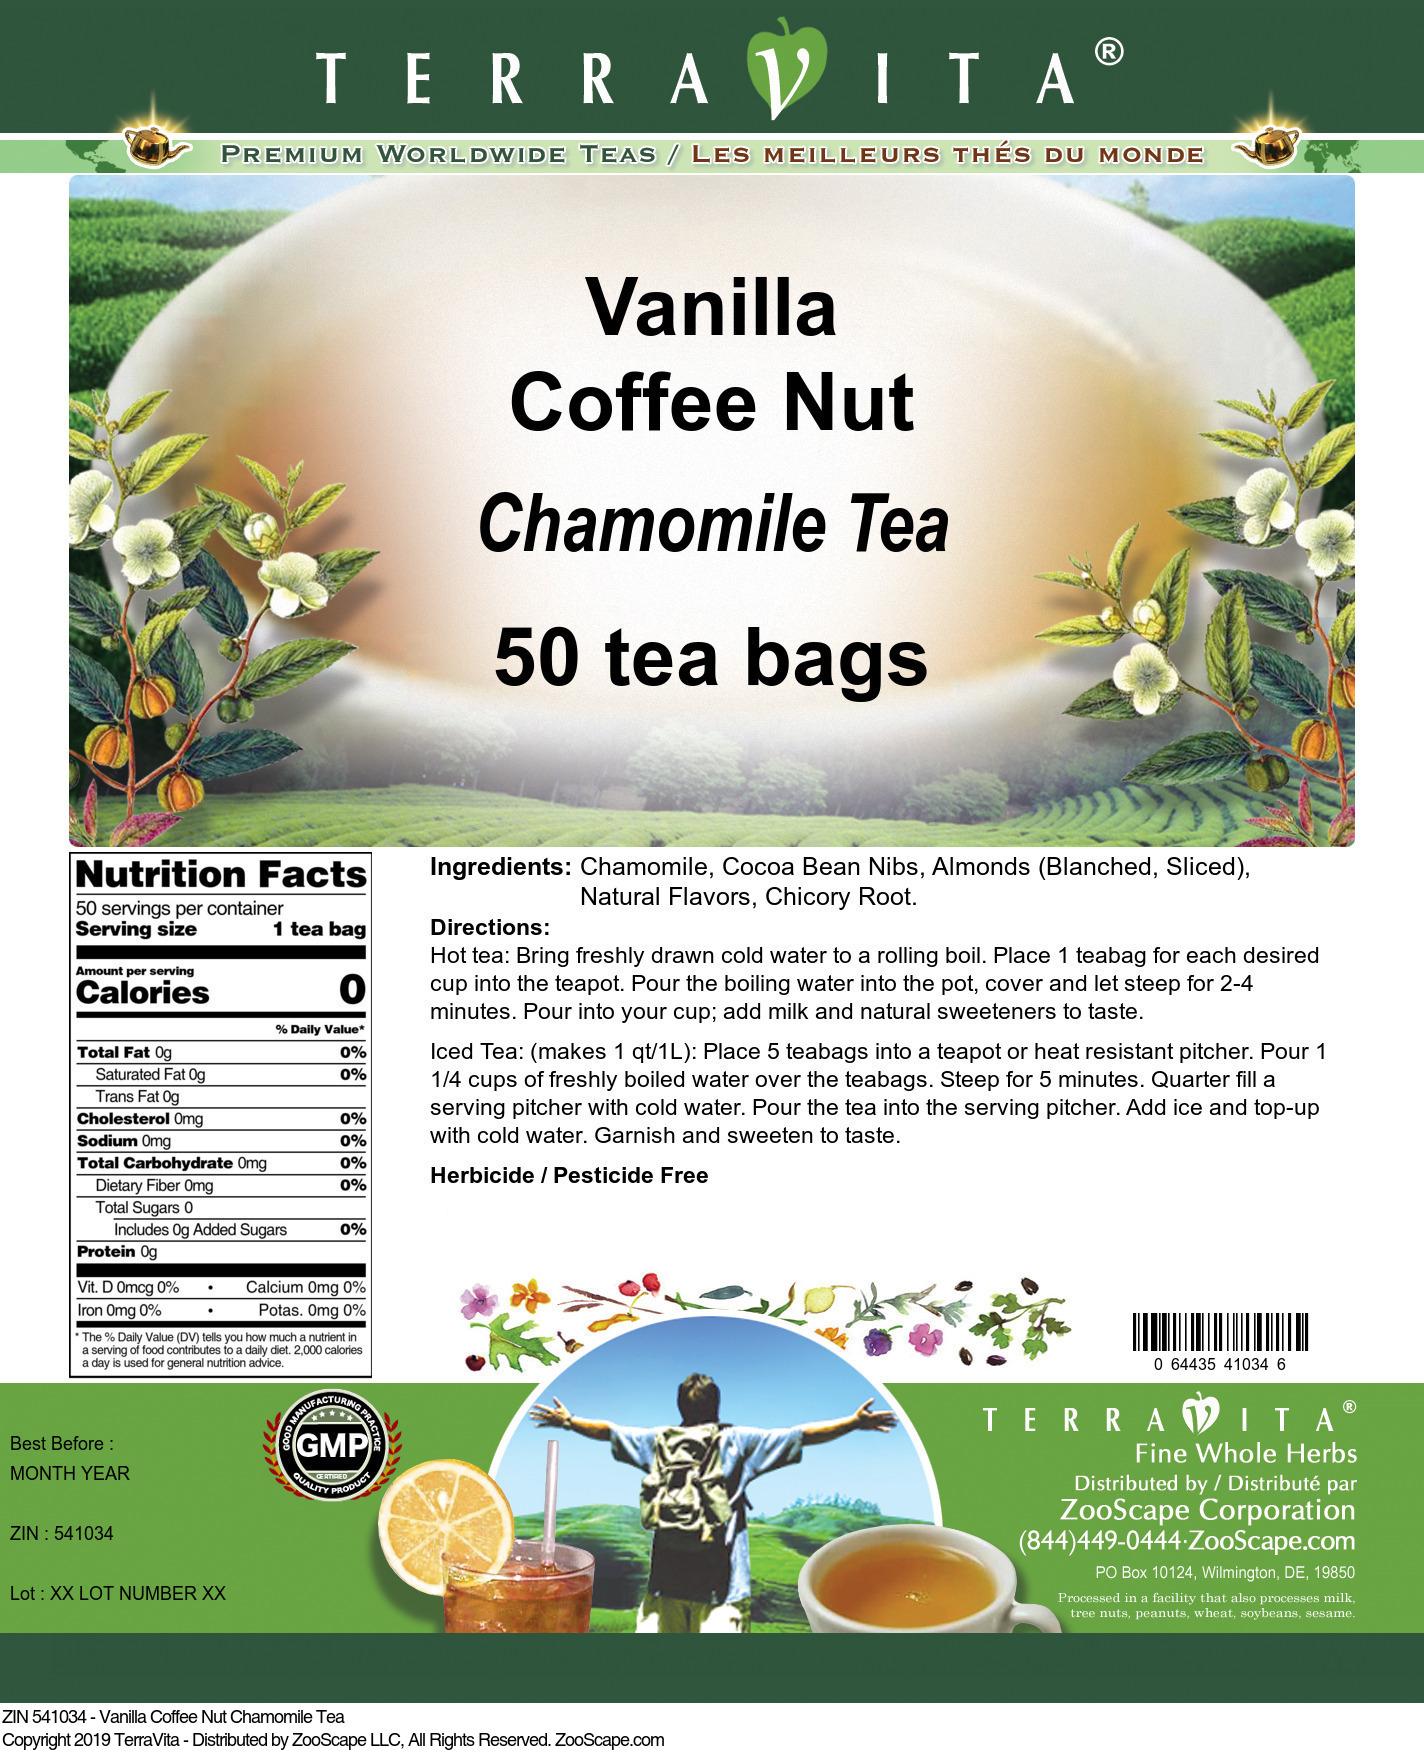 Vanilla Coffee Nut Chamomile Tea